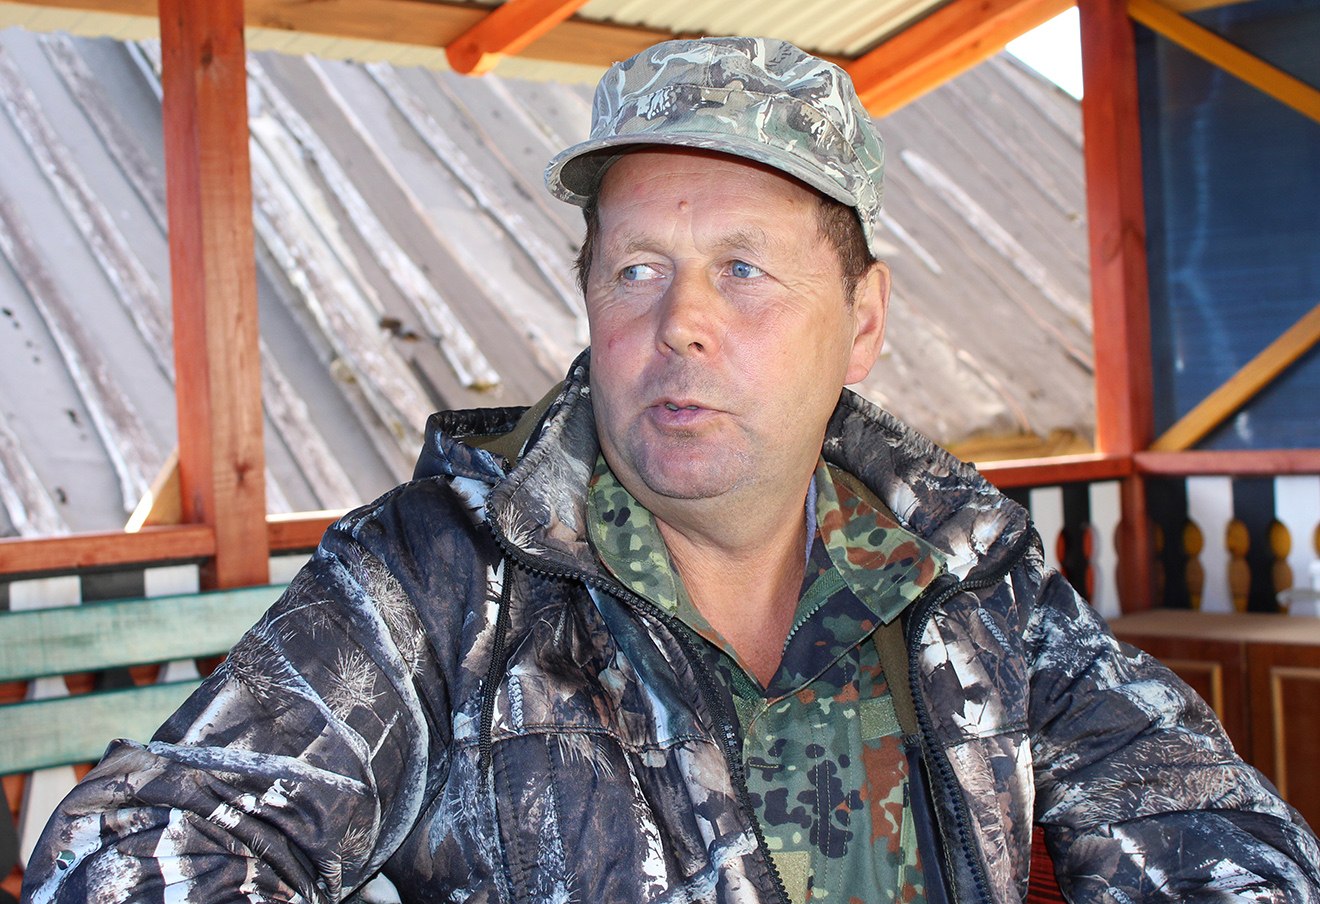 Староста деревни Василий Зайцев. Фото: 7x7-journal.ru